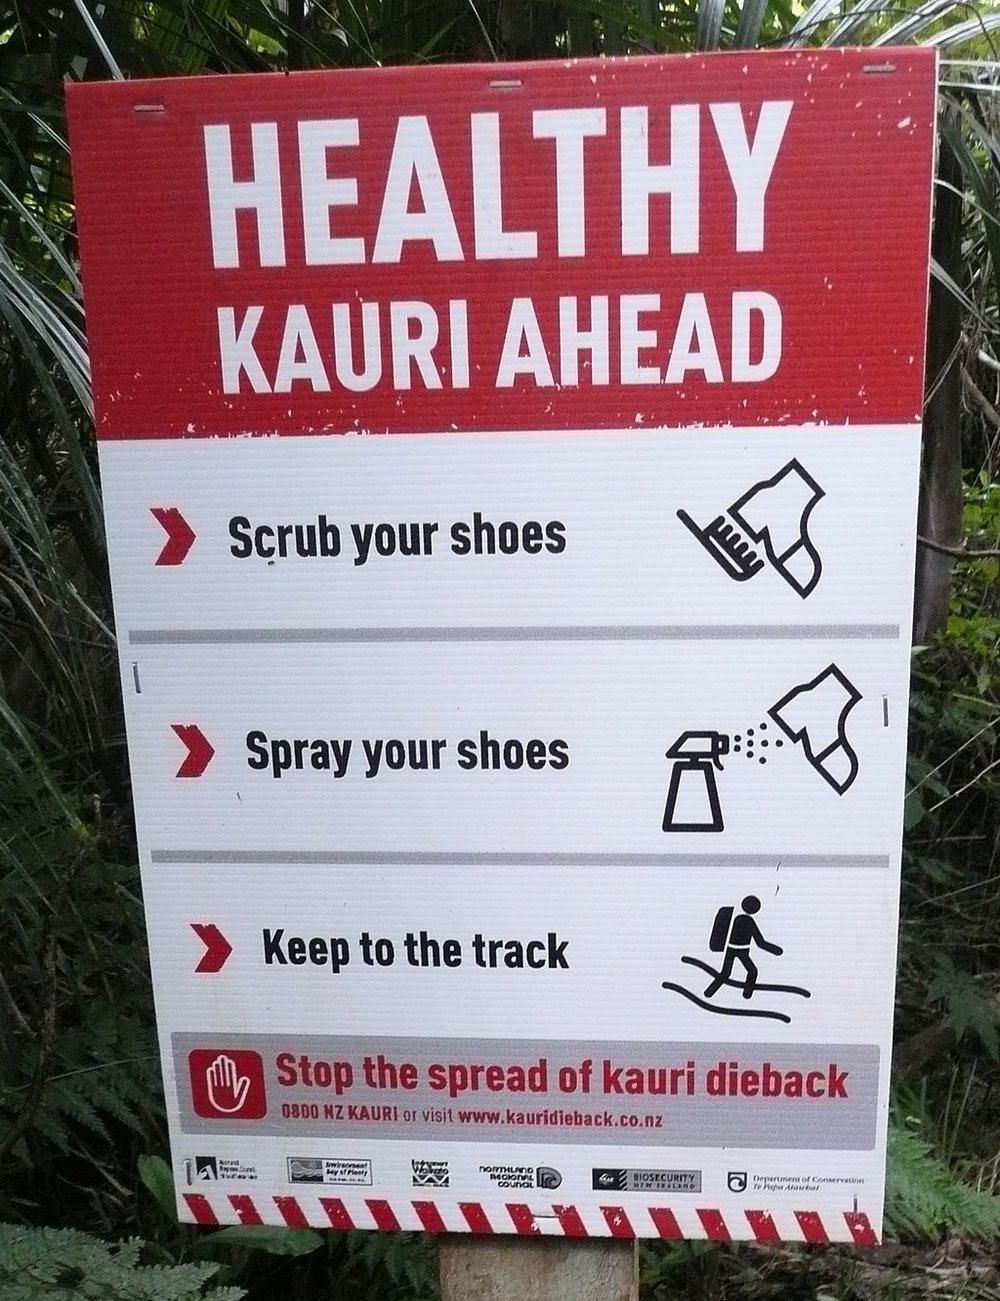 1024px-Kauri_dieback_sign.jpg